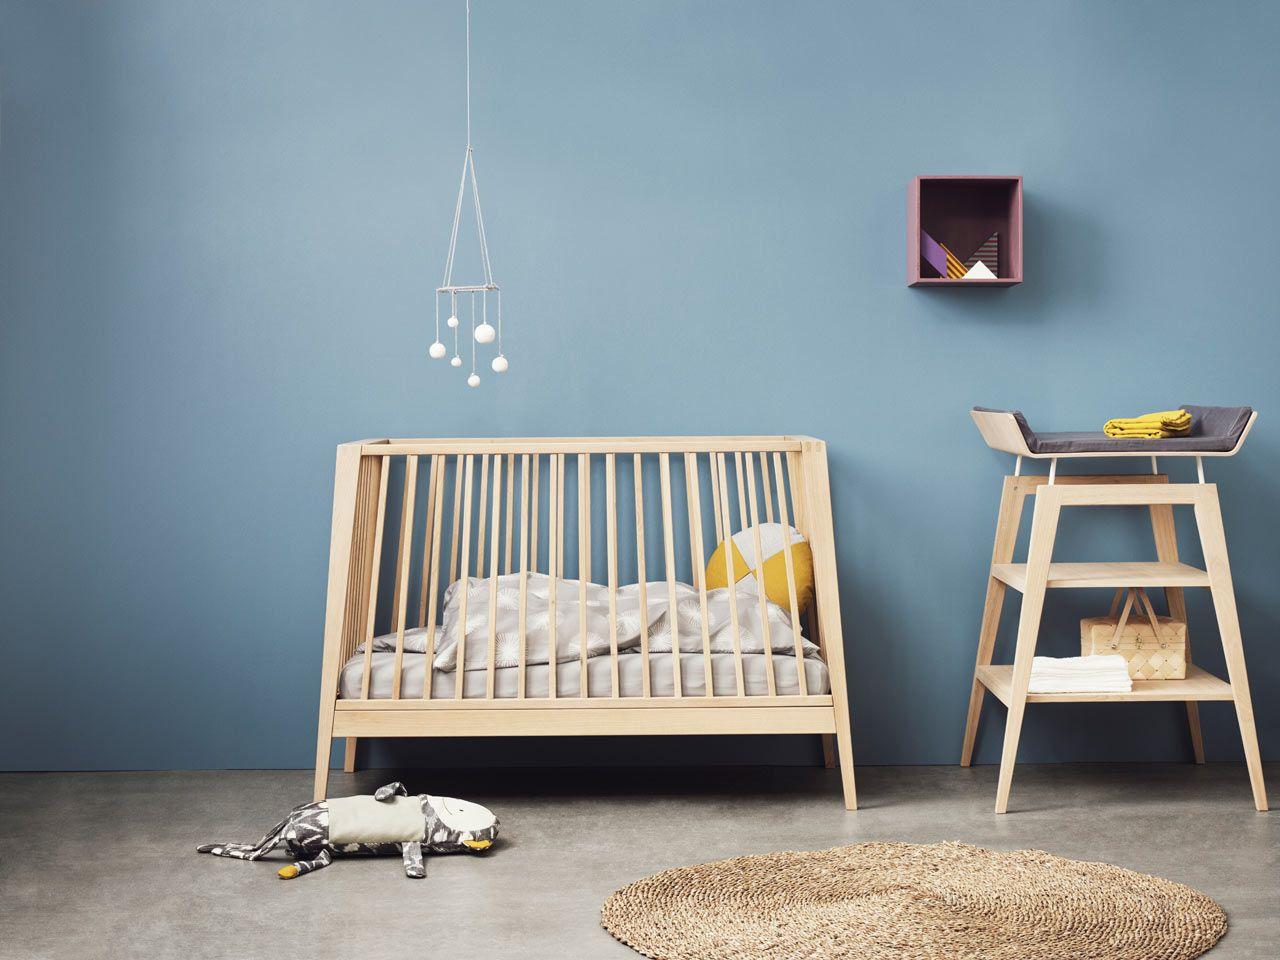 Nubie Leander Linea Cot 4 Design Milk Baby Room Wall Decals Furniture Nz Baby Furniture